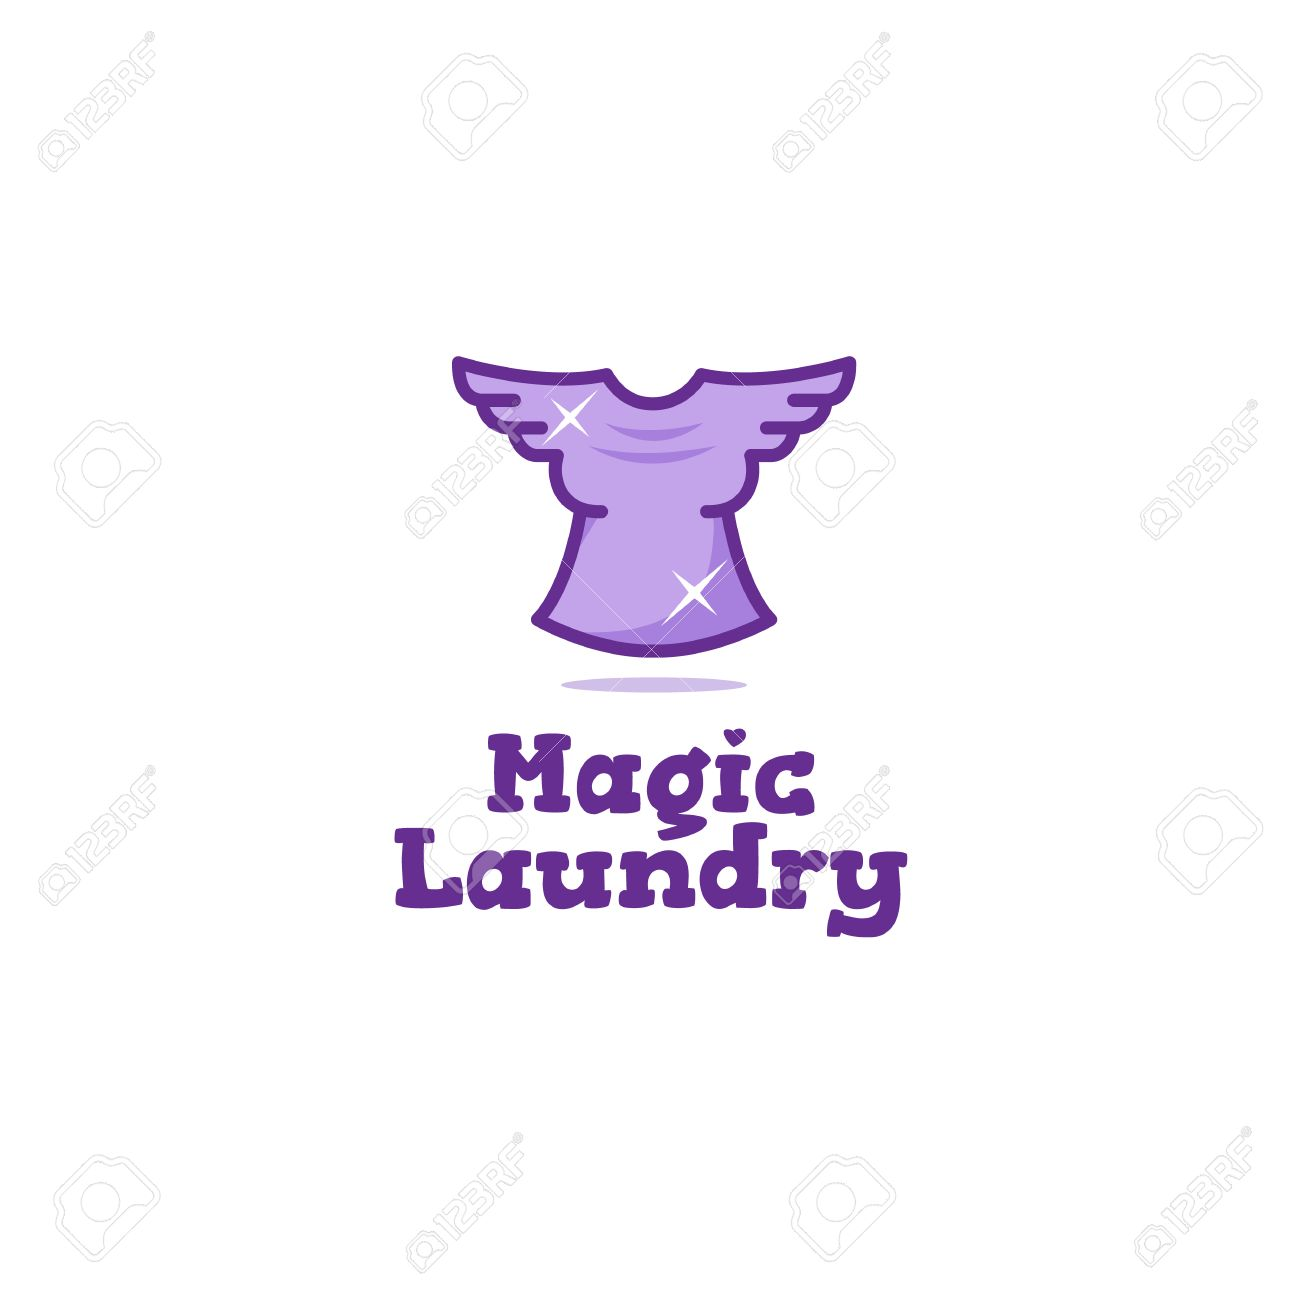 Creative laundry logo flying t shirt with wings dry cleaning flying t shirt with wings dry cleaning symbol stock vector buycottarizona Choice Image